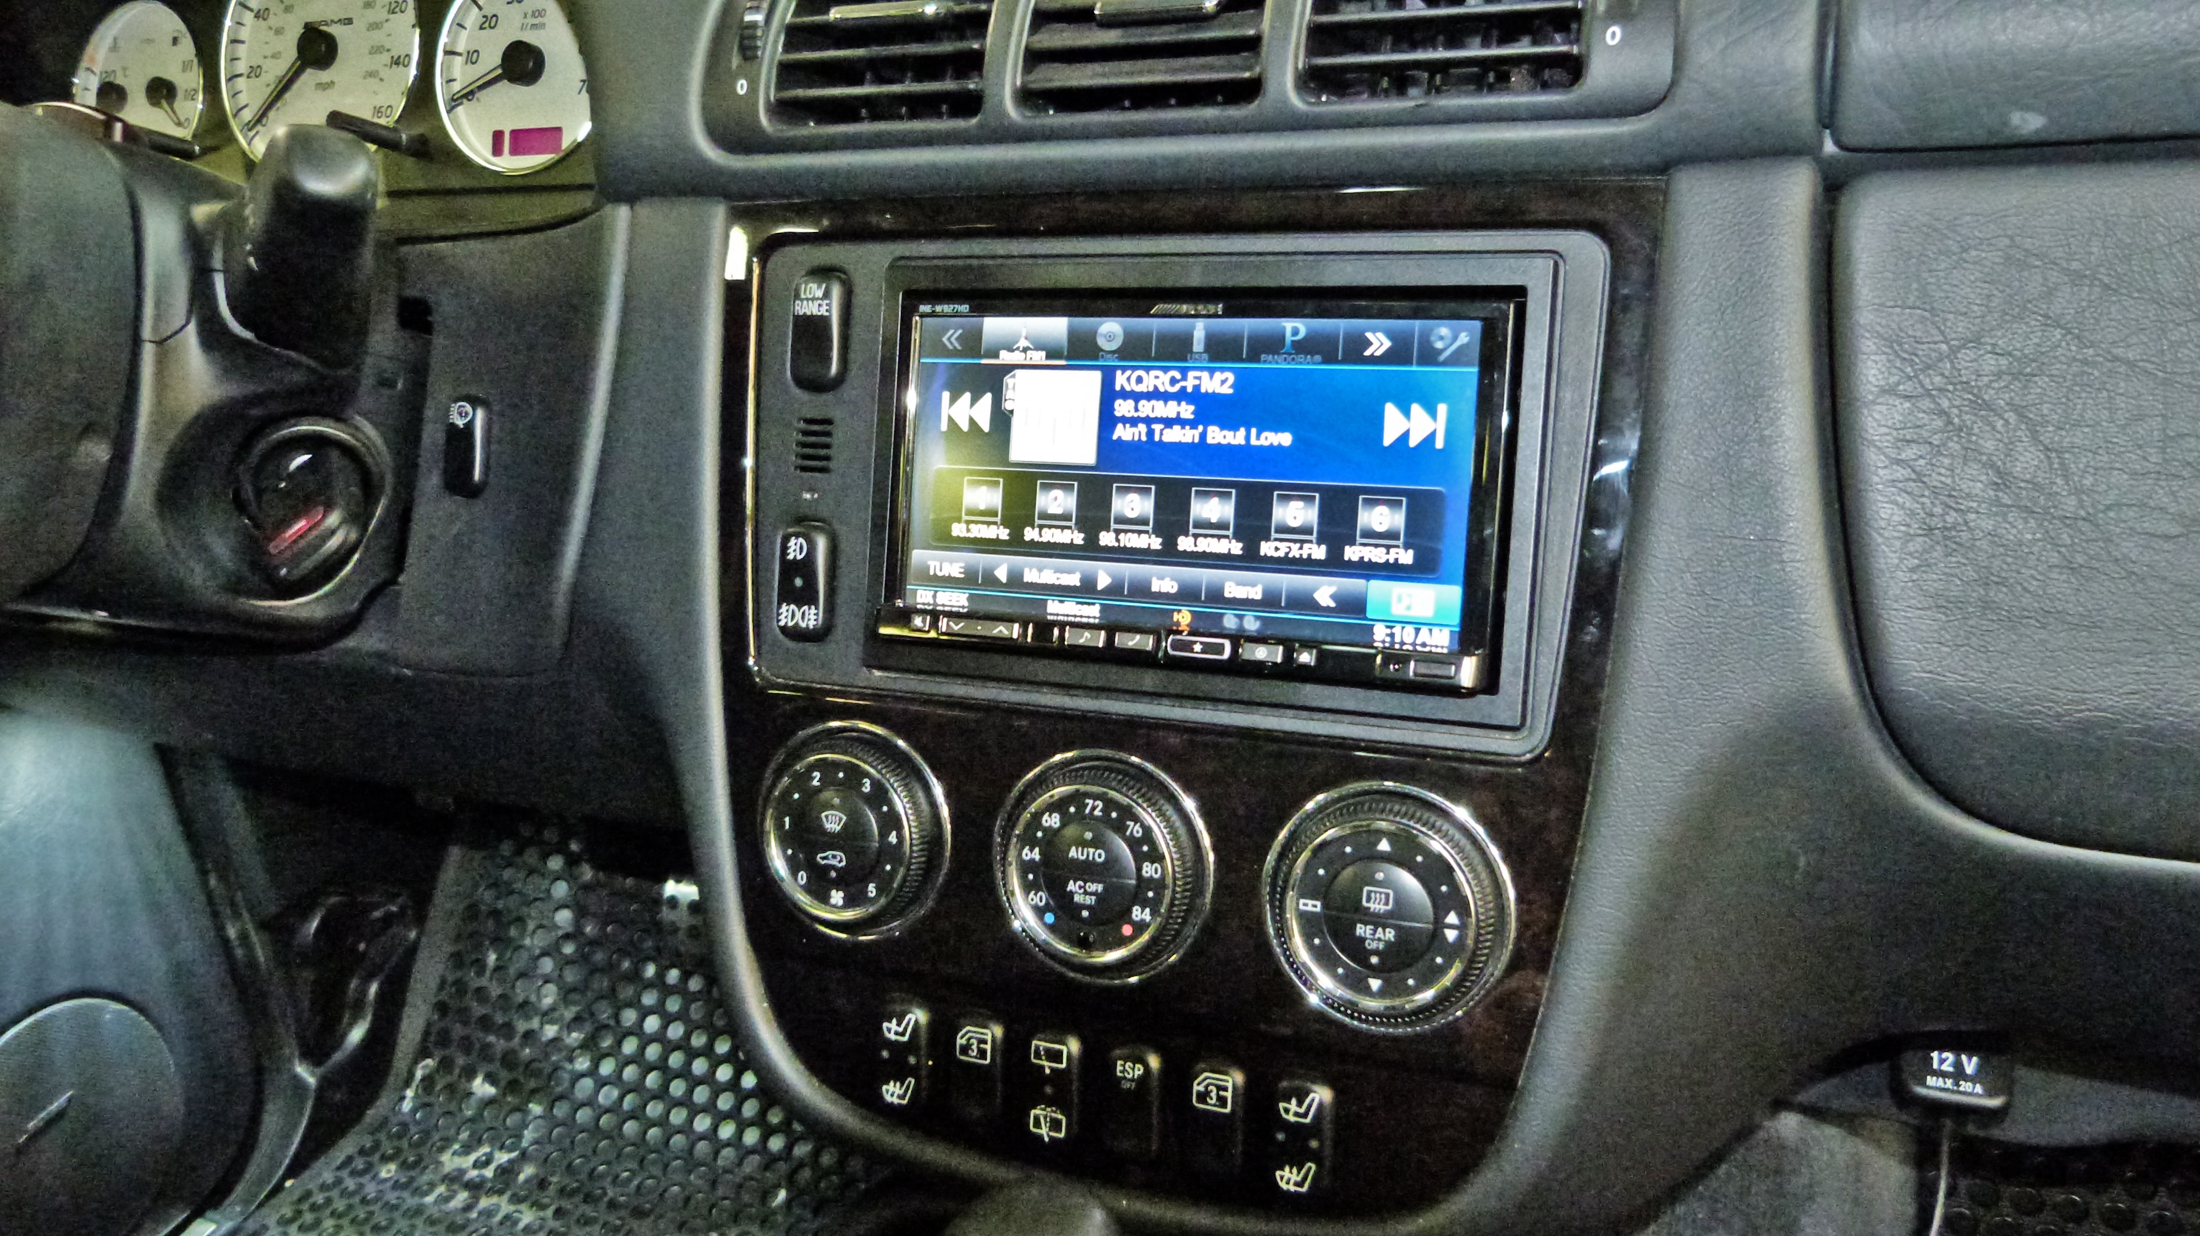 Mercedes ML55 AMG | Santa Fe Auto Sound